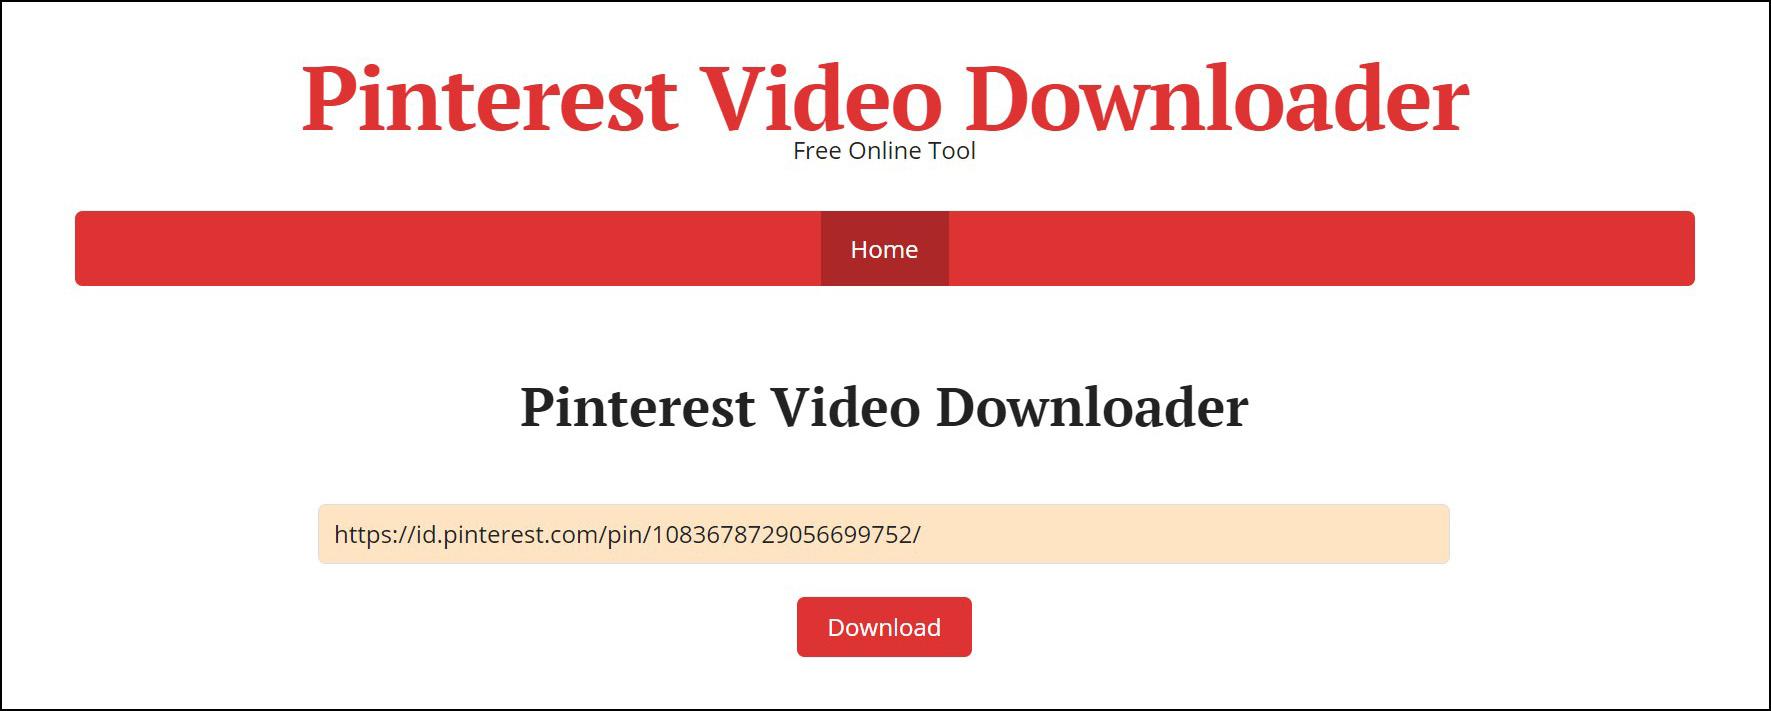 1 Buka halaman Pinterest Video Downloader